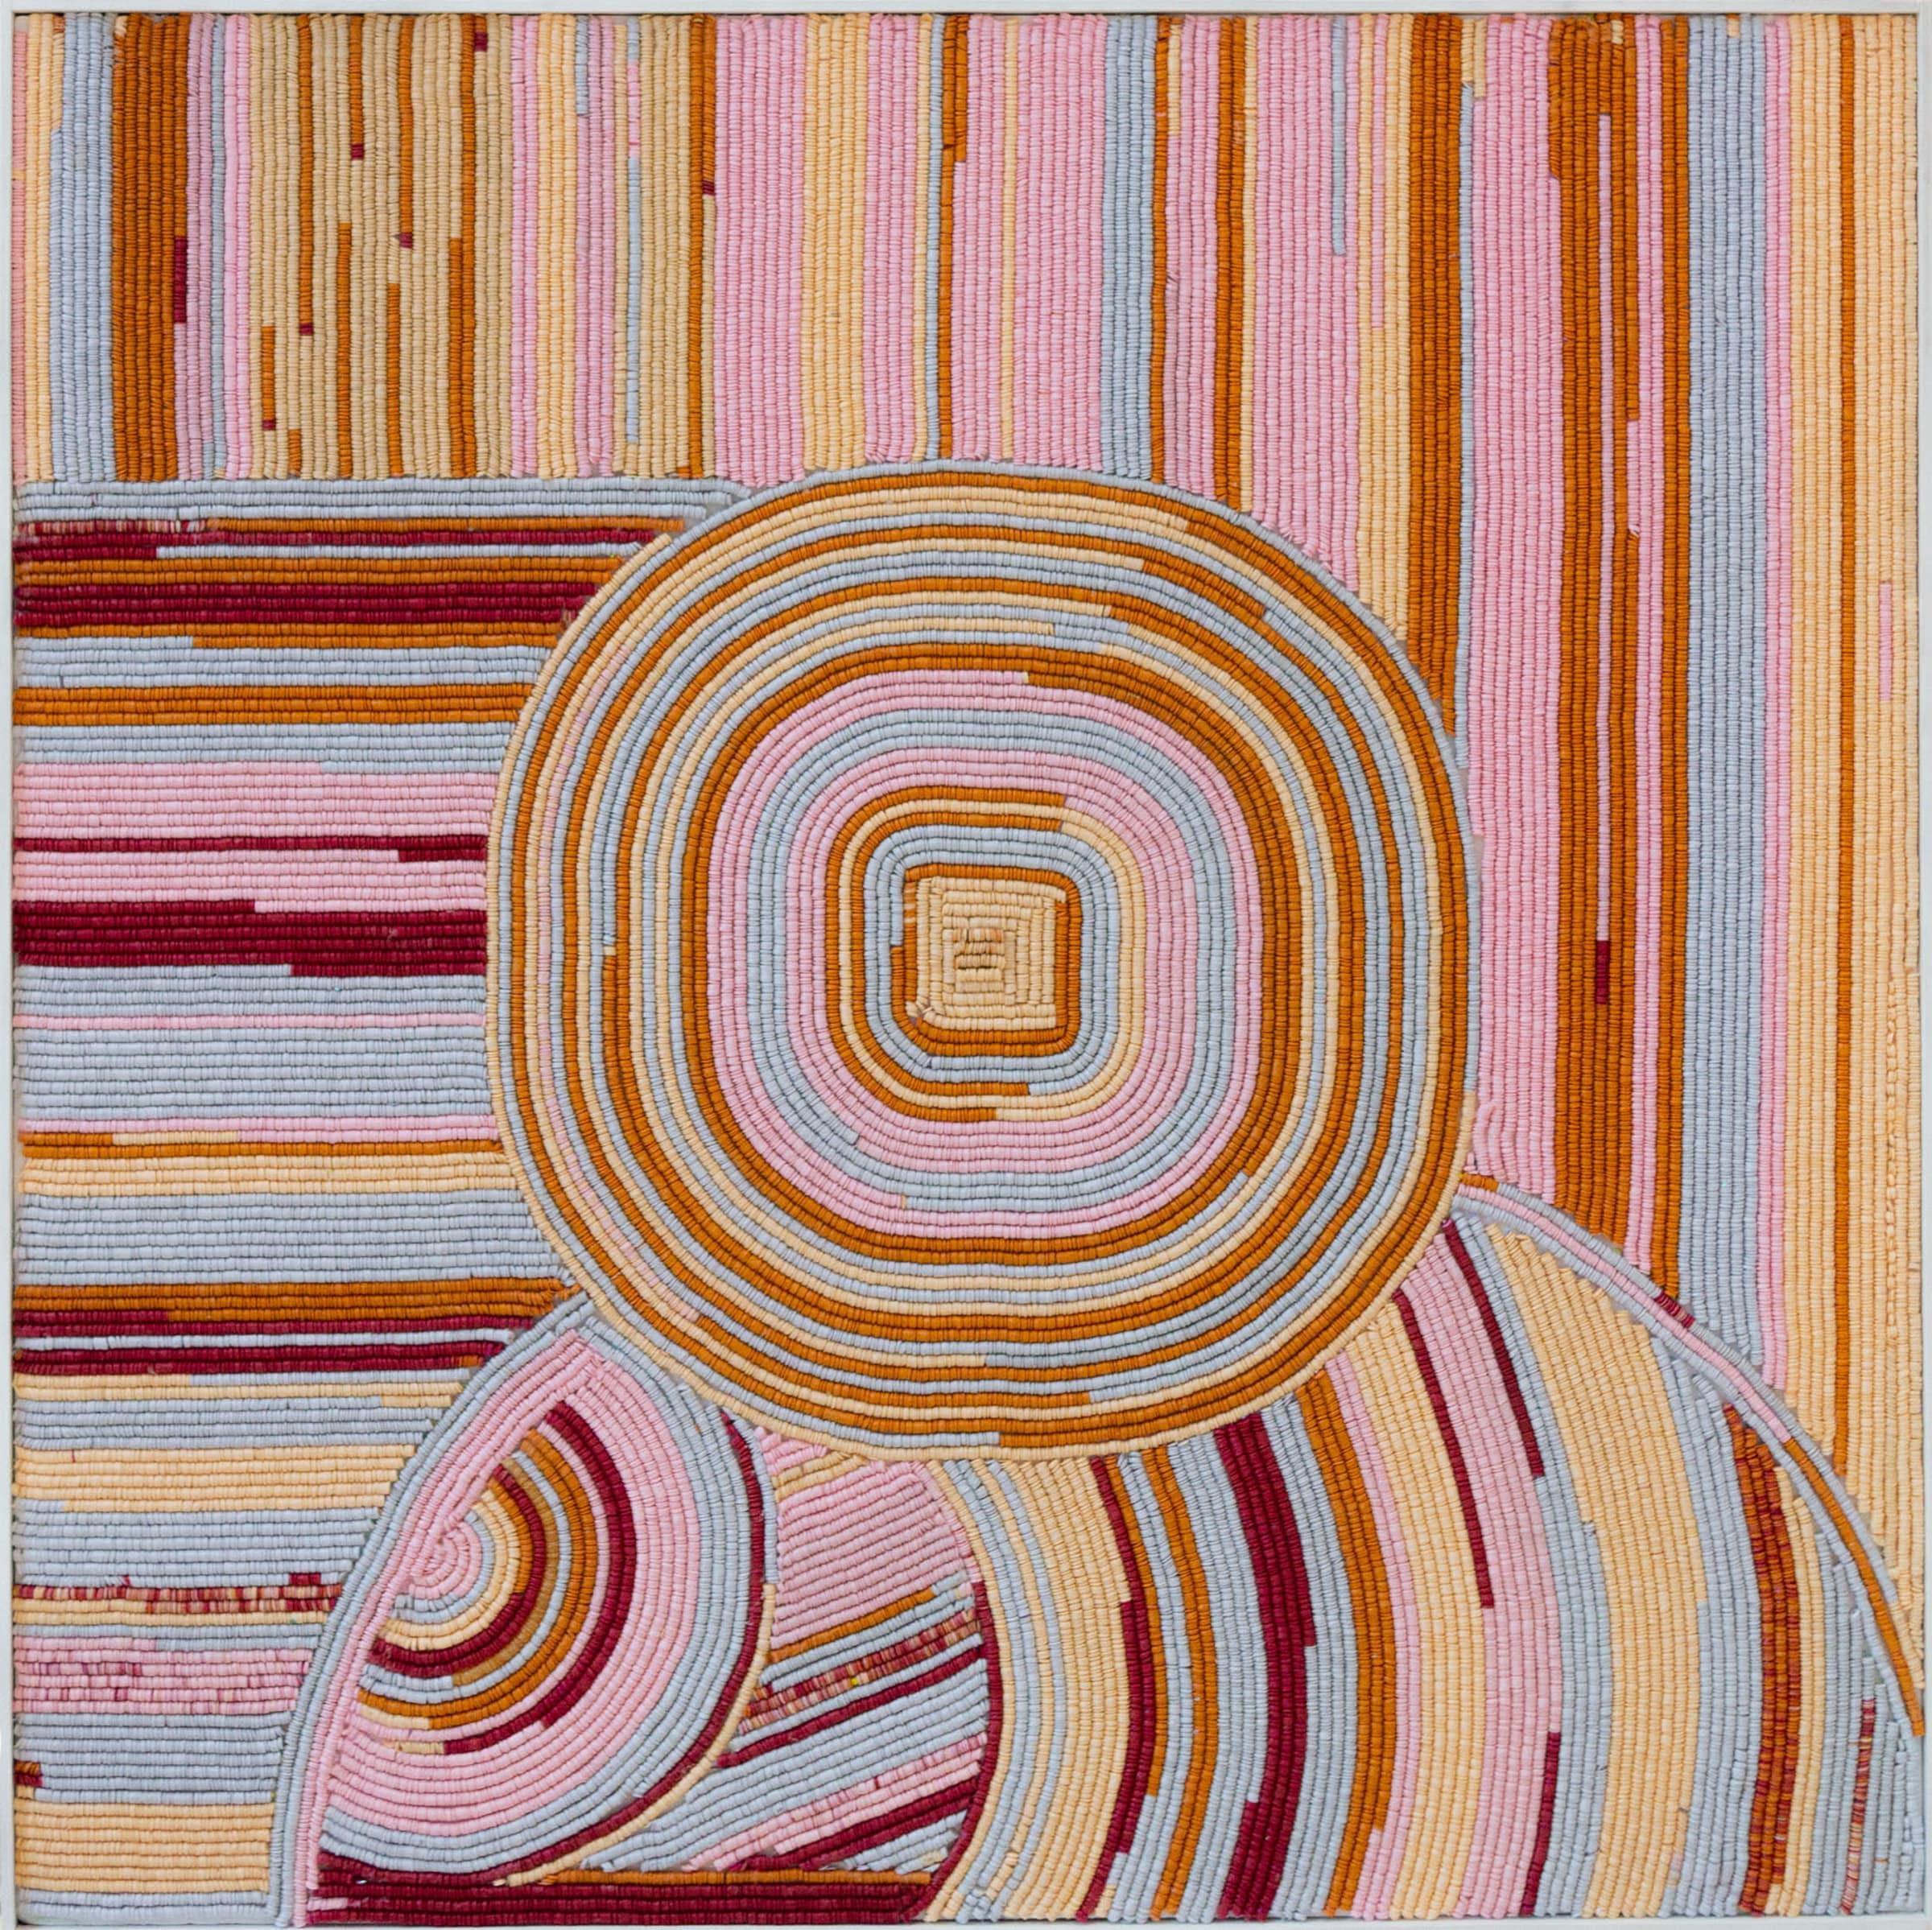 <span class=&#34;link fancybox-details-link&#34;><a href=&#34;/artists/85-leanne-shakenovsky/works/3124-leanne-shakenovsky-frame-i-2017/&#34;>View Detail Page</a></span><div class=&#34;artist&#34;><strong>Leanne Shakenovsky</strong></div> <div class=&#34;title&#34;><em>Frame I</em>, 2017</div> <div class=&#34;medium&#34;>Sequins, Fishing Line & Wood Glue</div> <div class=&#34;dimensions&#34;>100cm x 100cm</div><div class=&#34;price&#34;>R28,000.00</div>